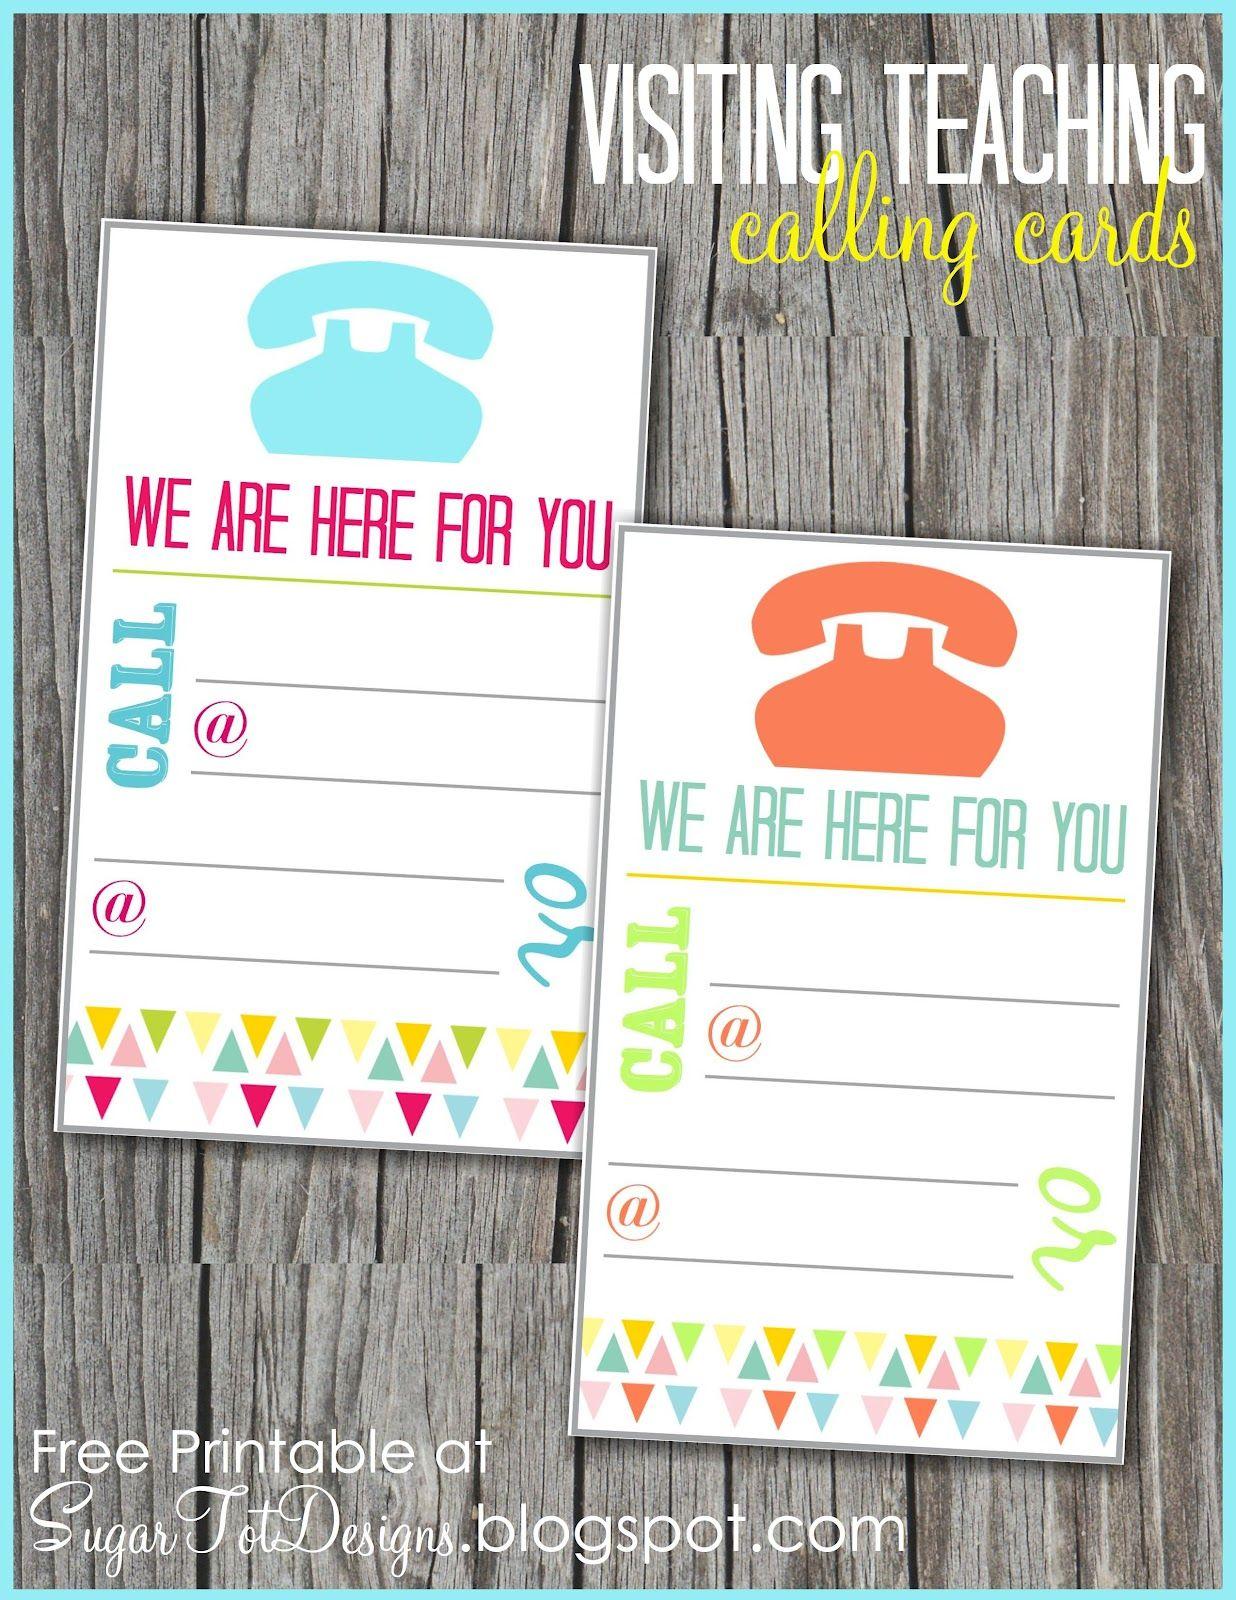 Visiting Teaching Message Calling Card- free printable